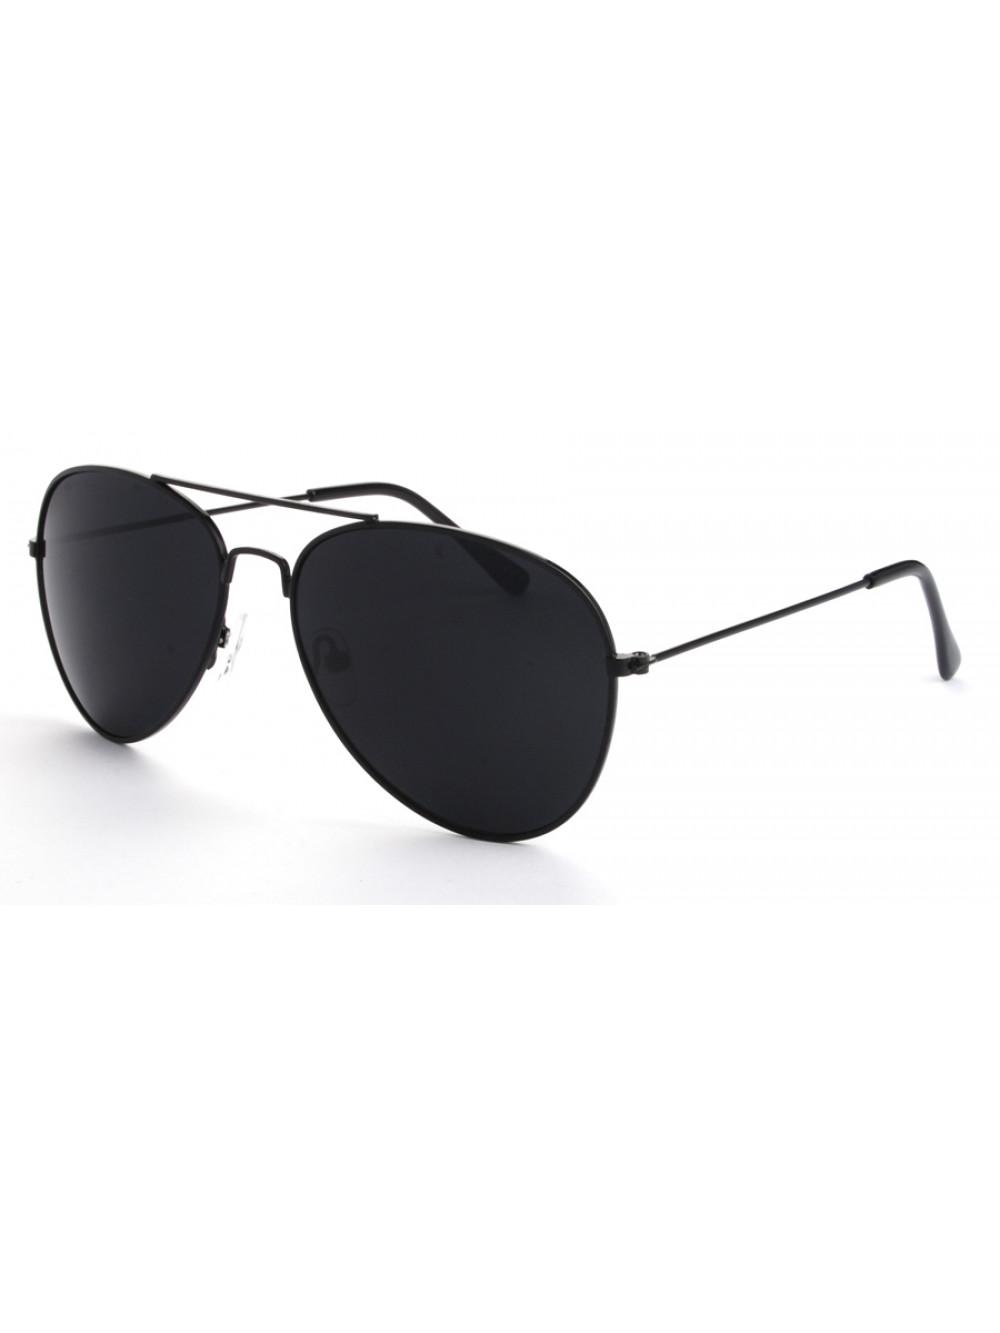 8420f9056 Slnečné okuliare Aviator Pilot Black čierne